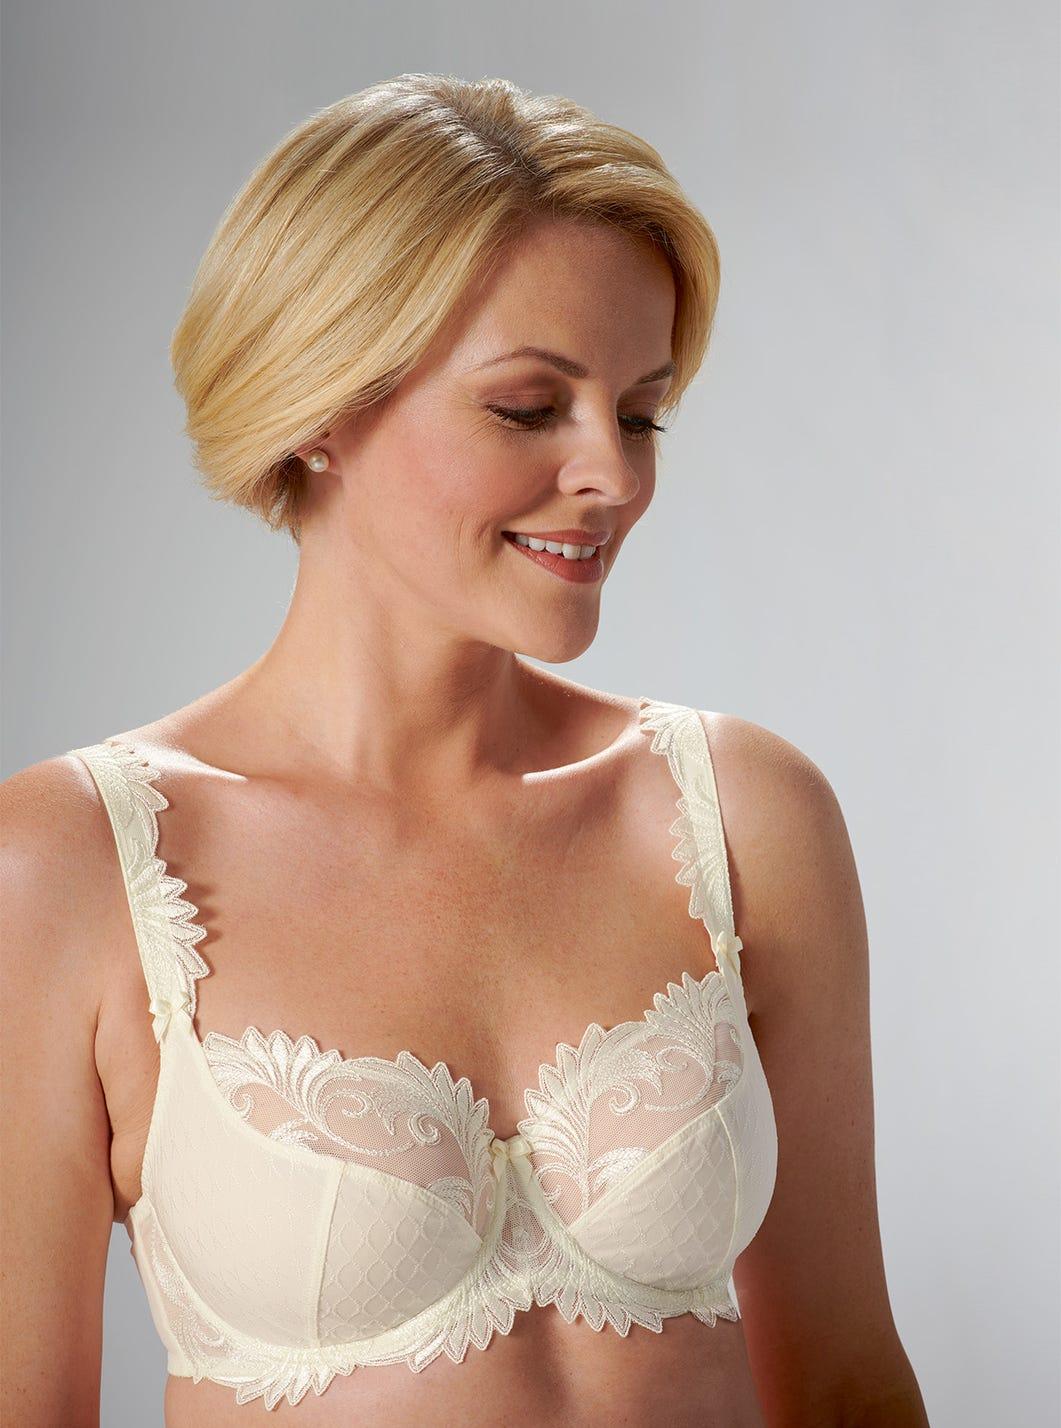 Luxury Lace Bra by Empreinte